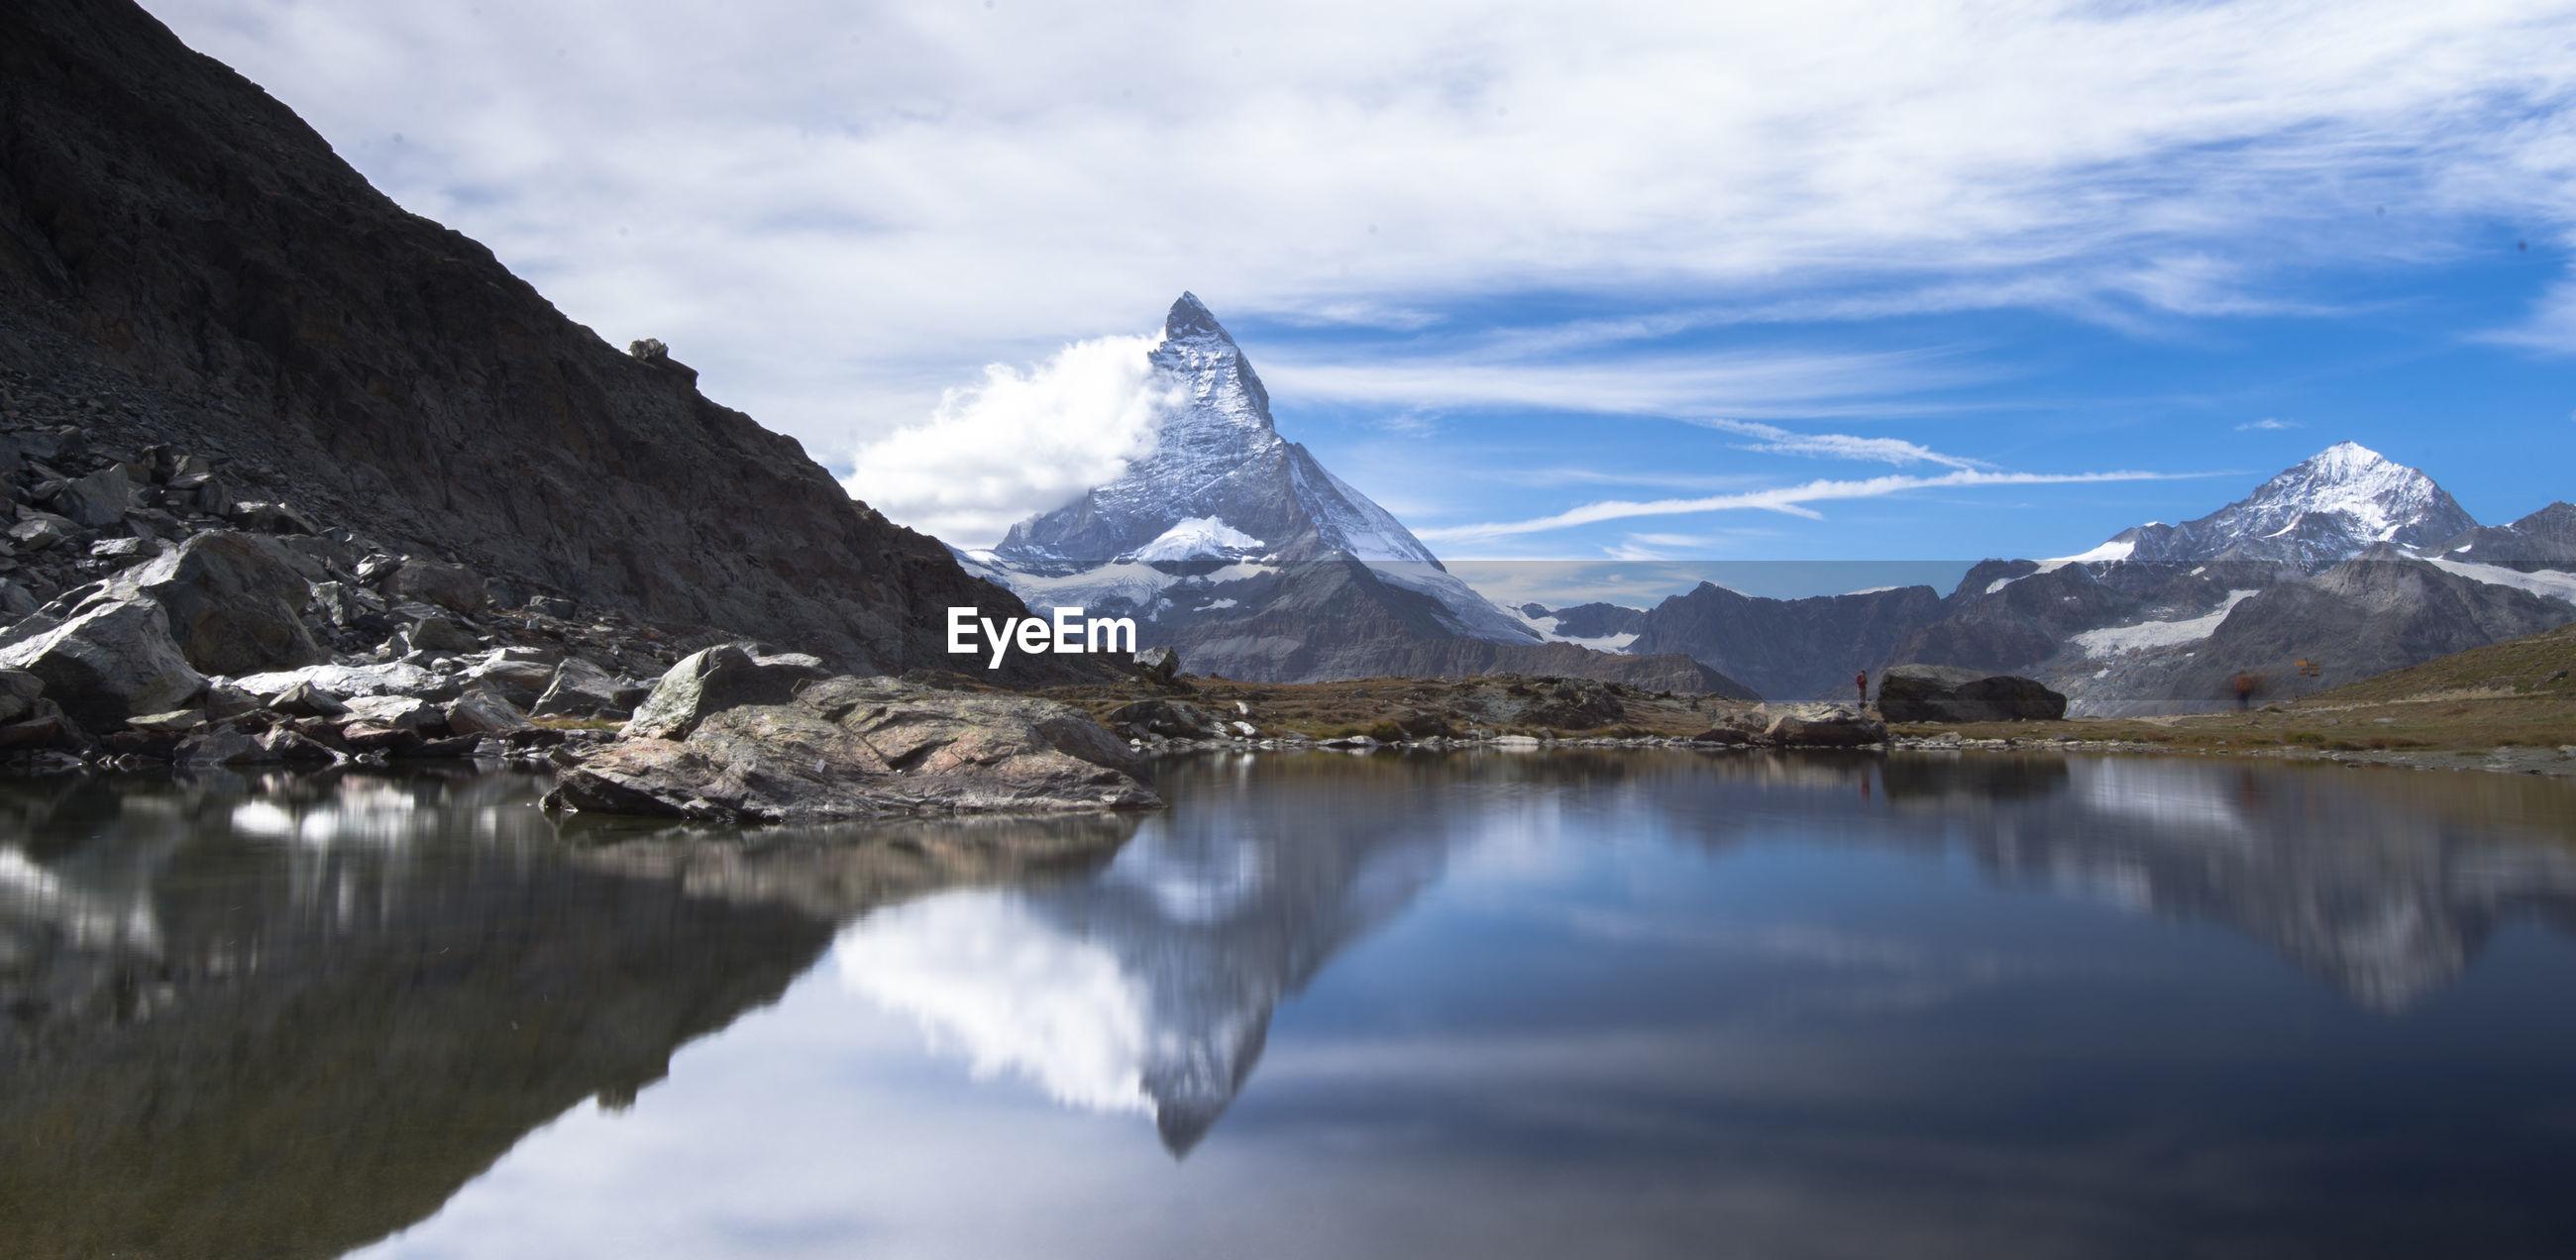 Matterhorn is a large, near-symmetric pyramidal peak in alps